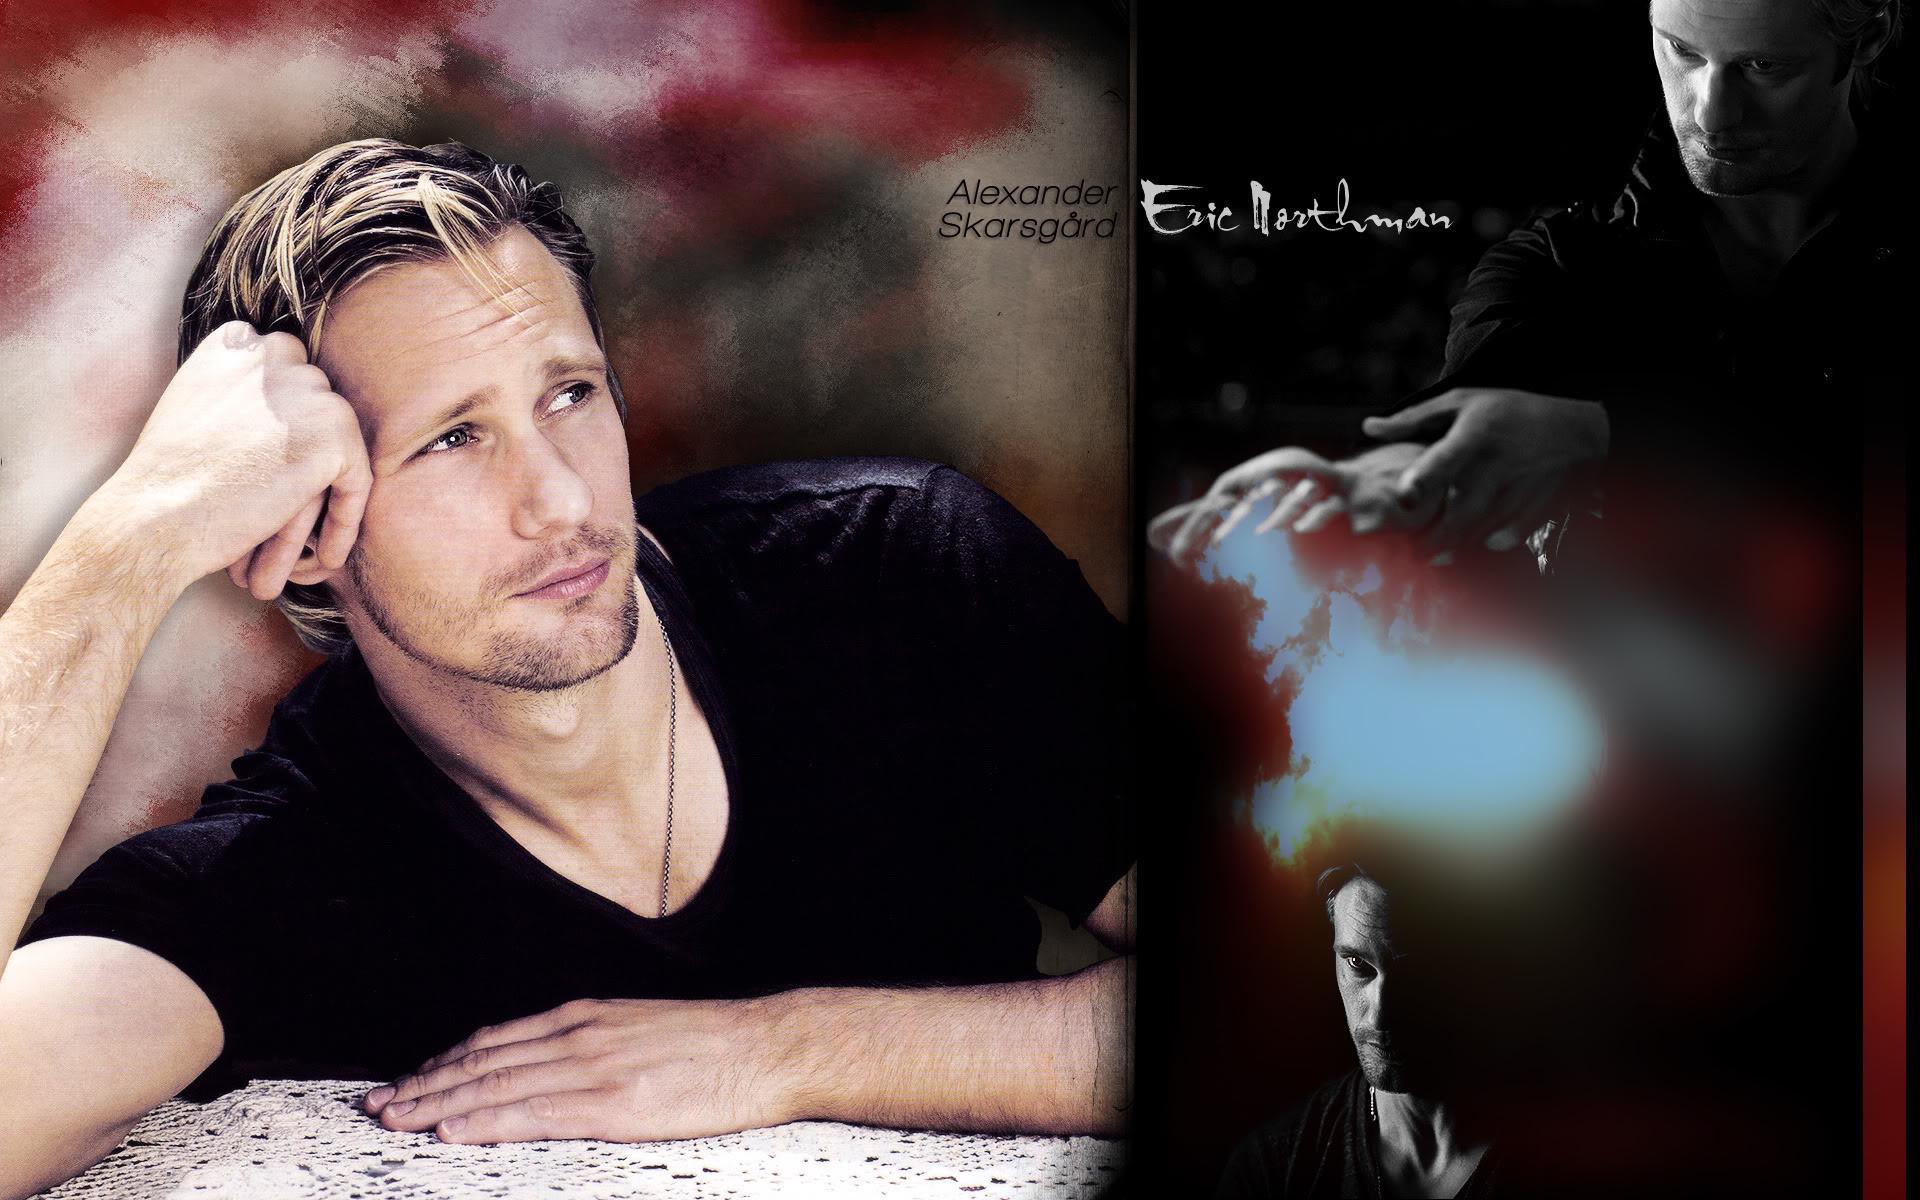 Eric Northman True Blood Wallpaper ·①